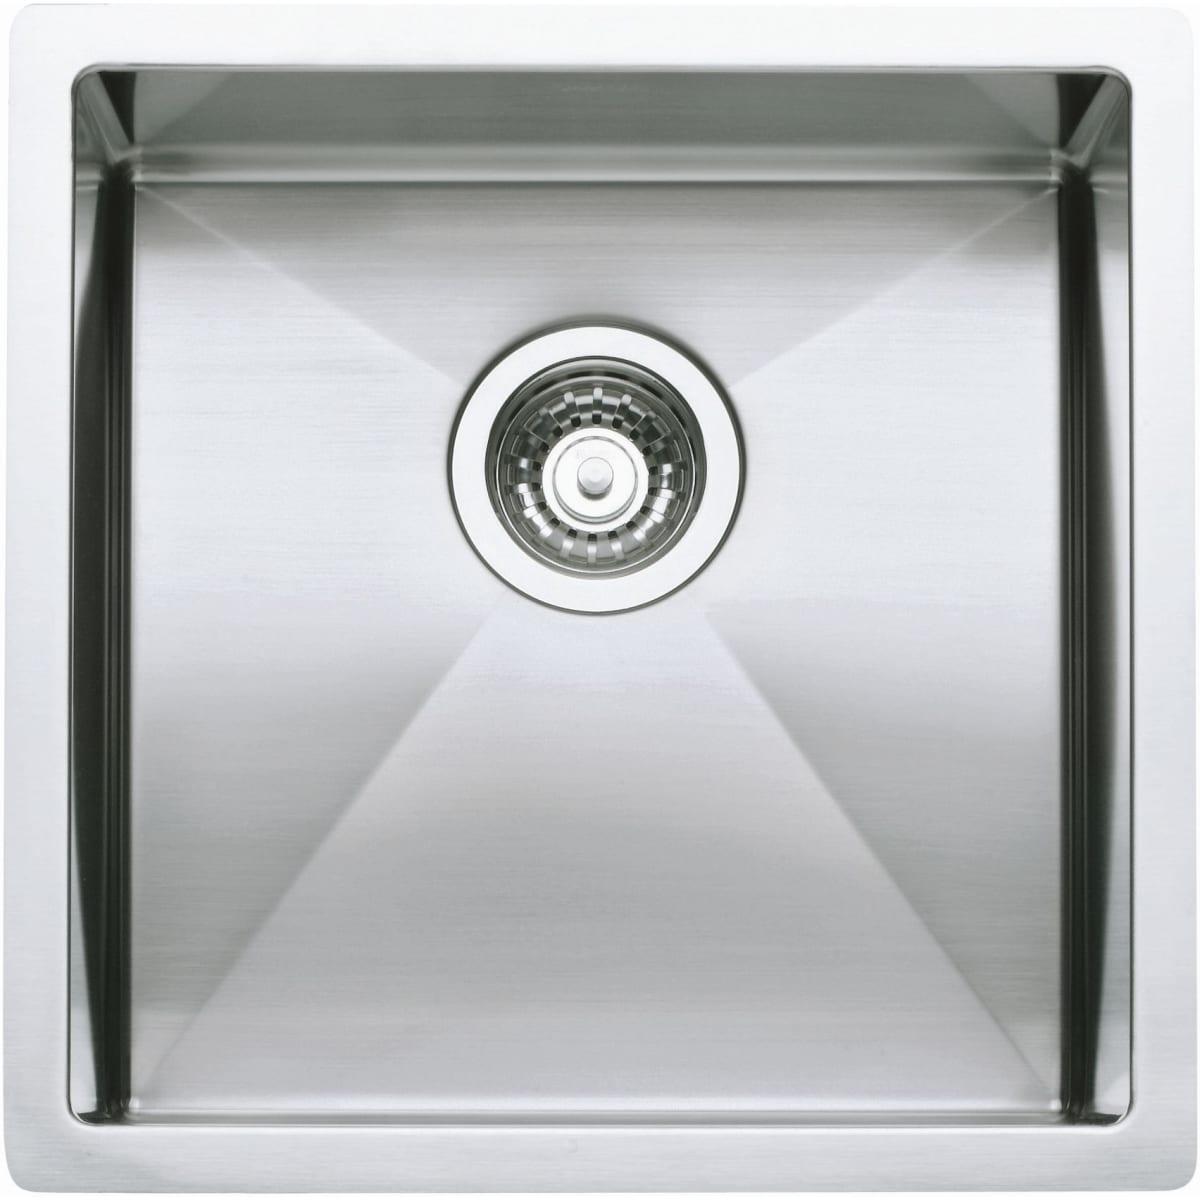 "Blanco Precision Single Basin Stainless Steel Bar Sink 17"" x 17"""